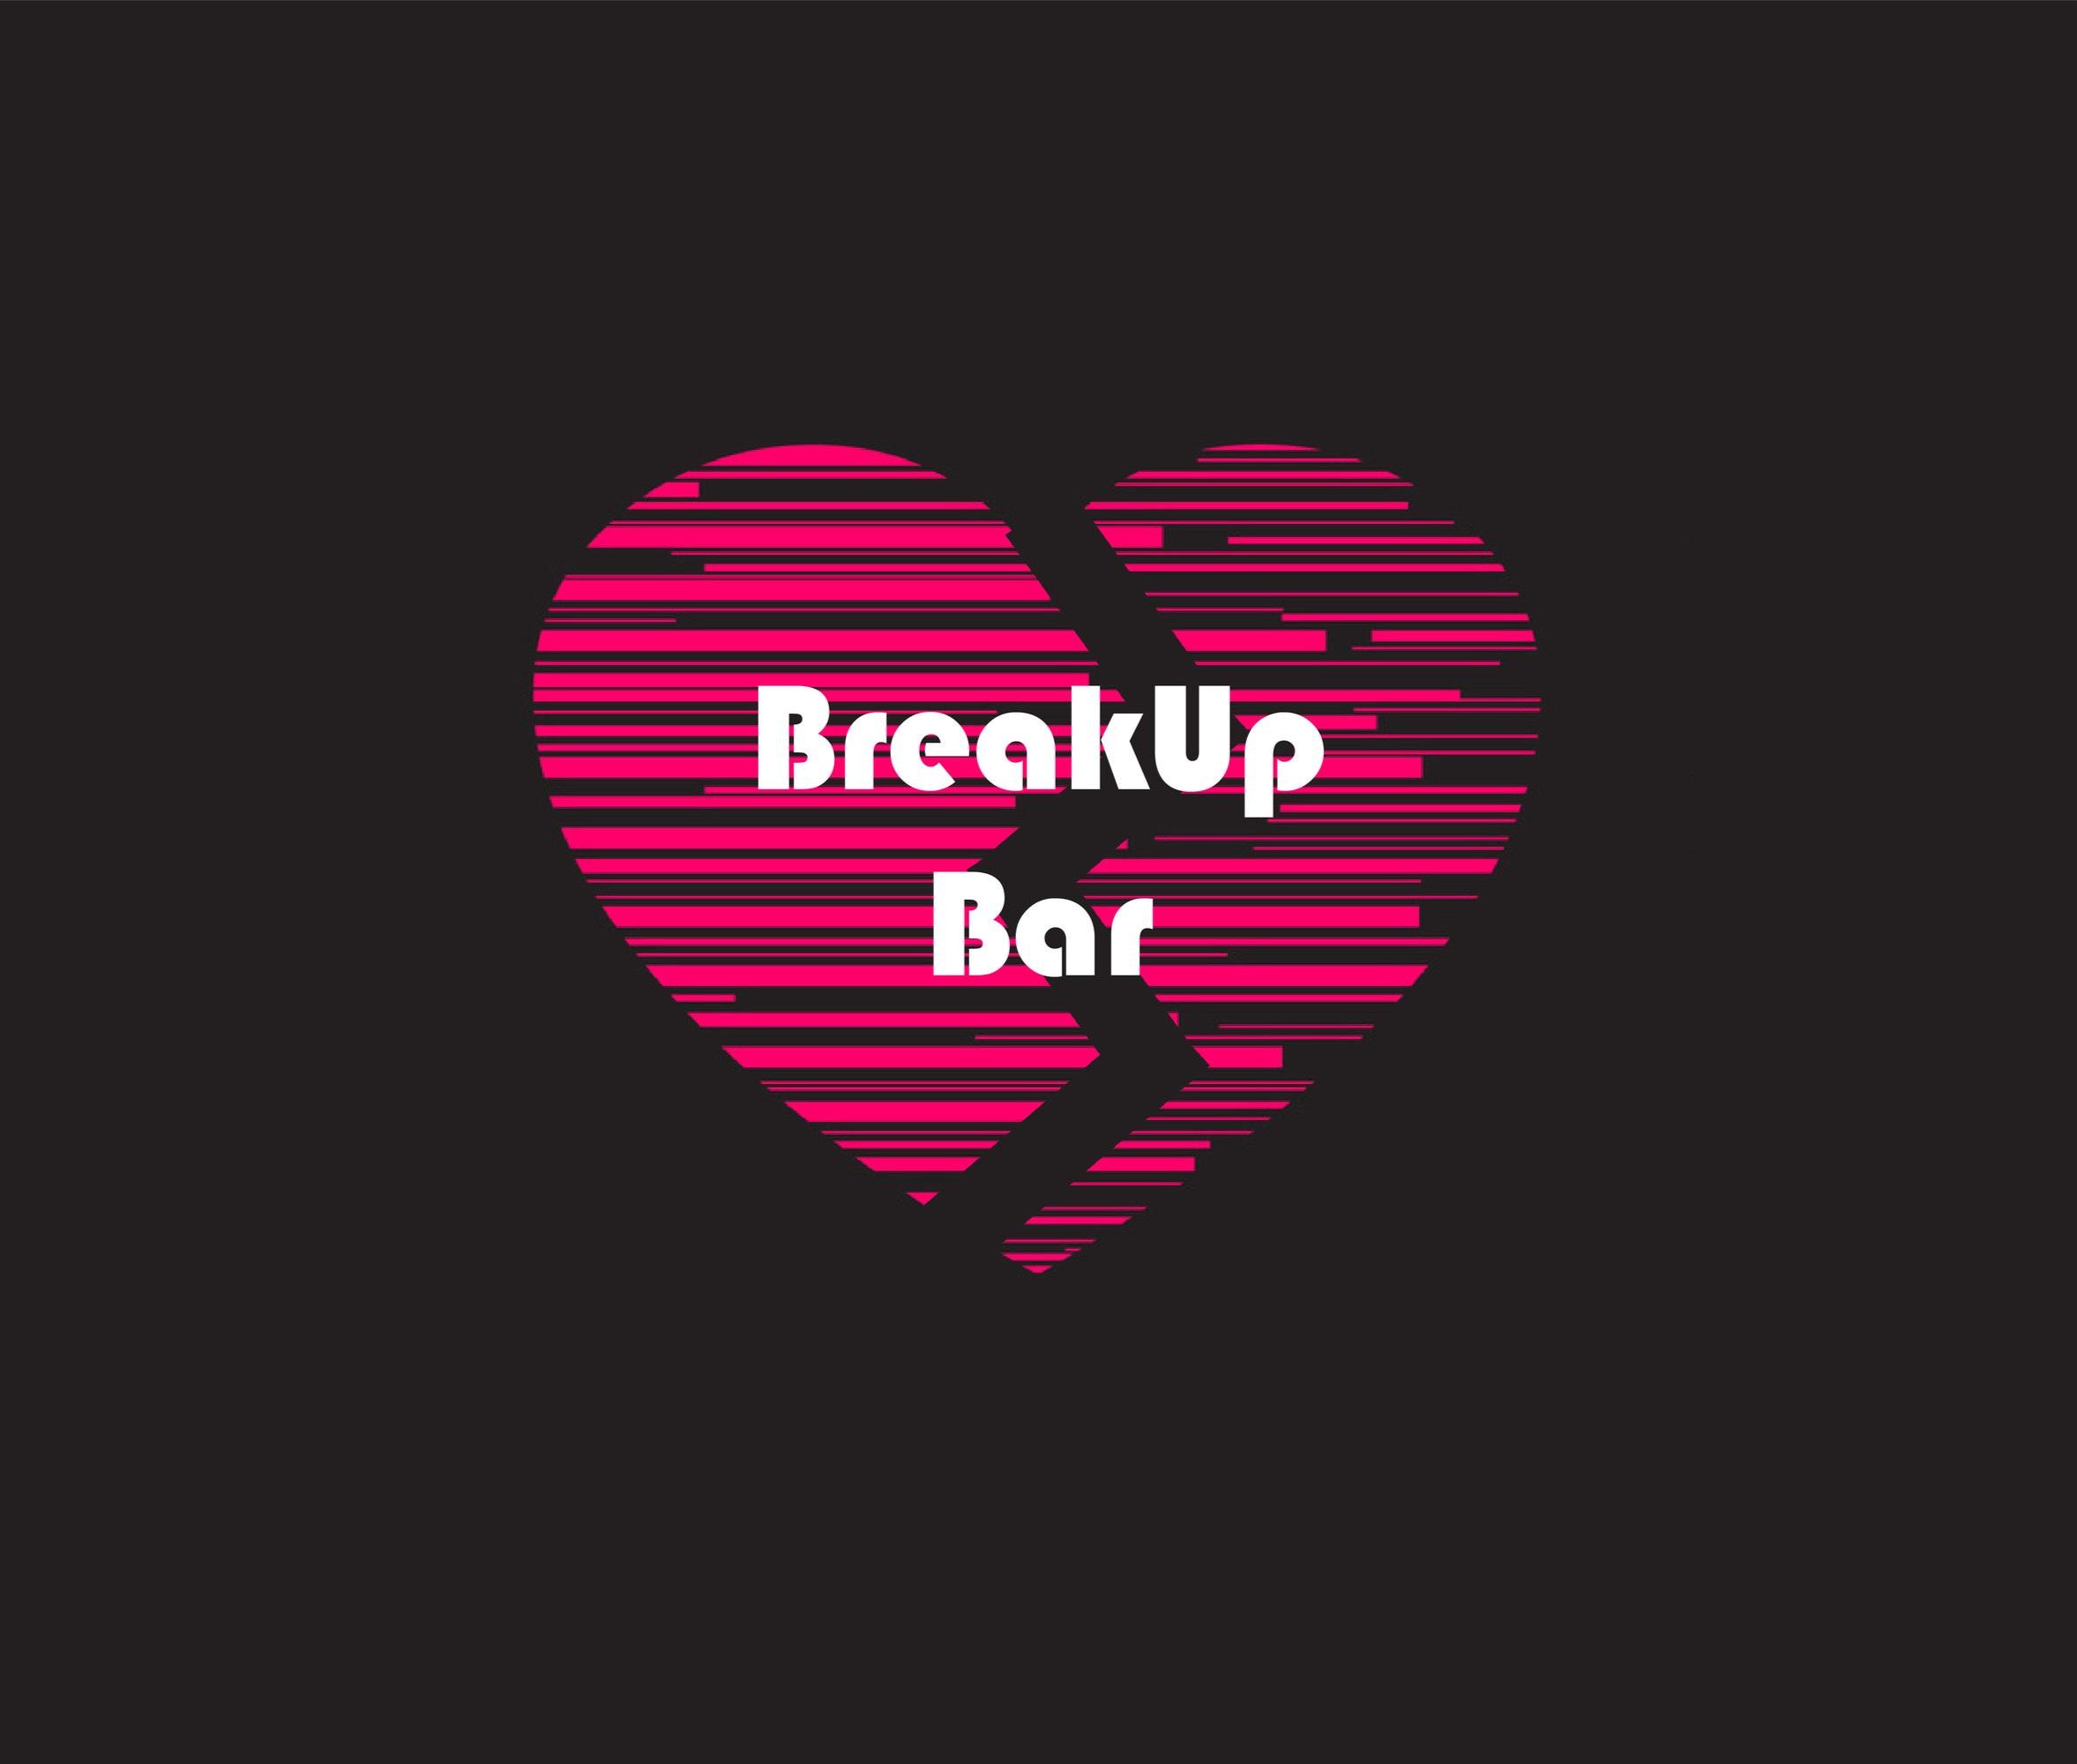 breakuplogowallpaperfinal.jpg